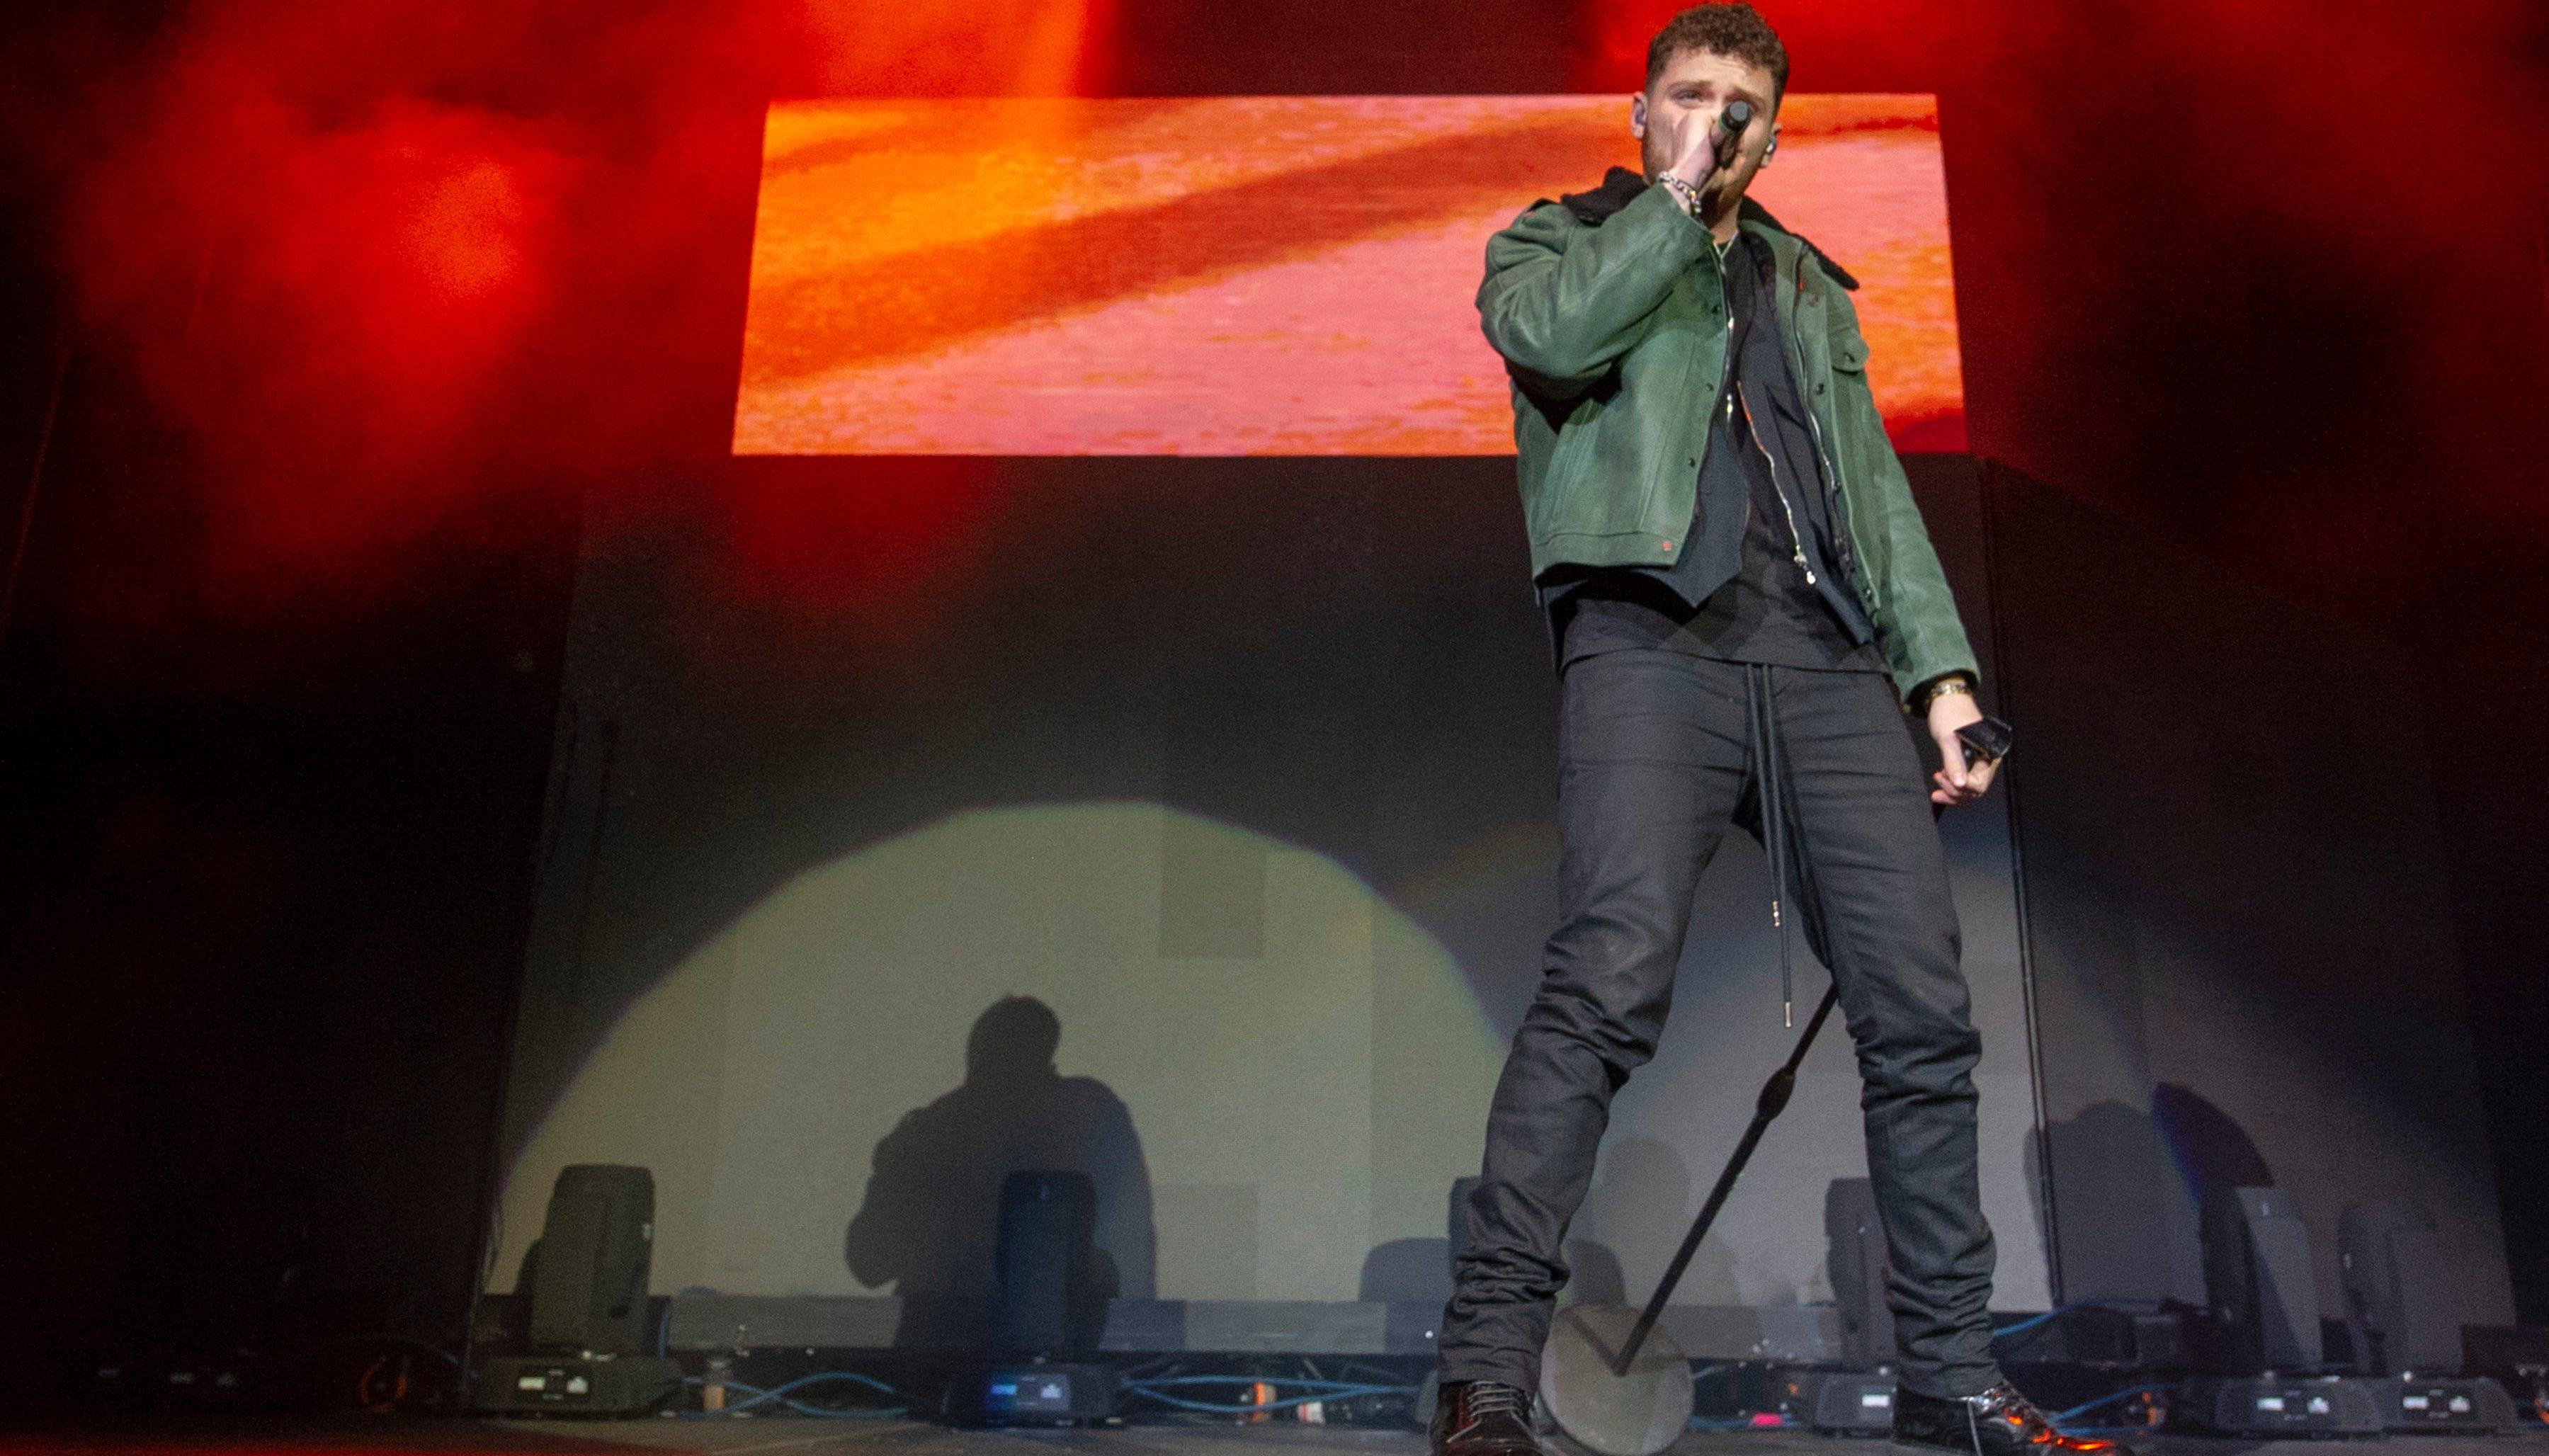 Coachella 2019: Bazzi brings out Ty Dolla $ign for Saturday festival set